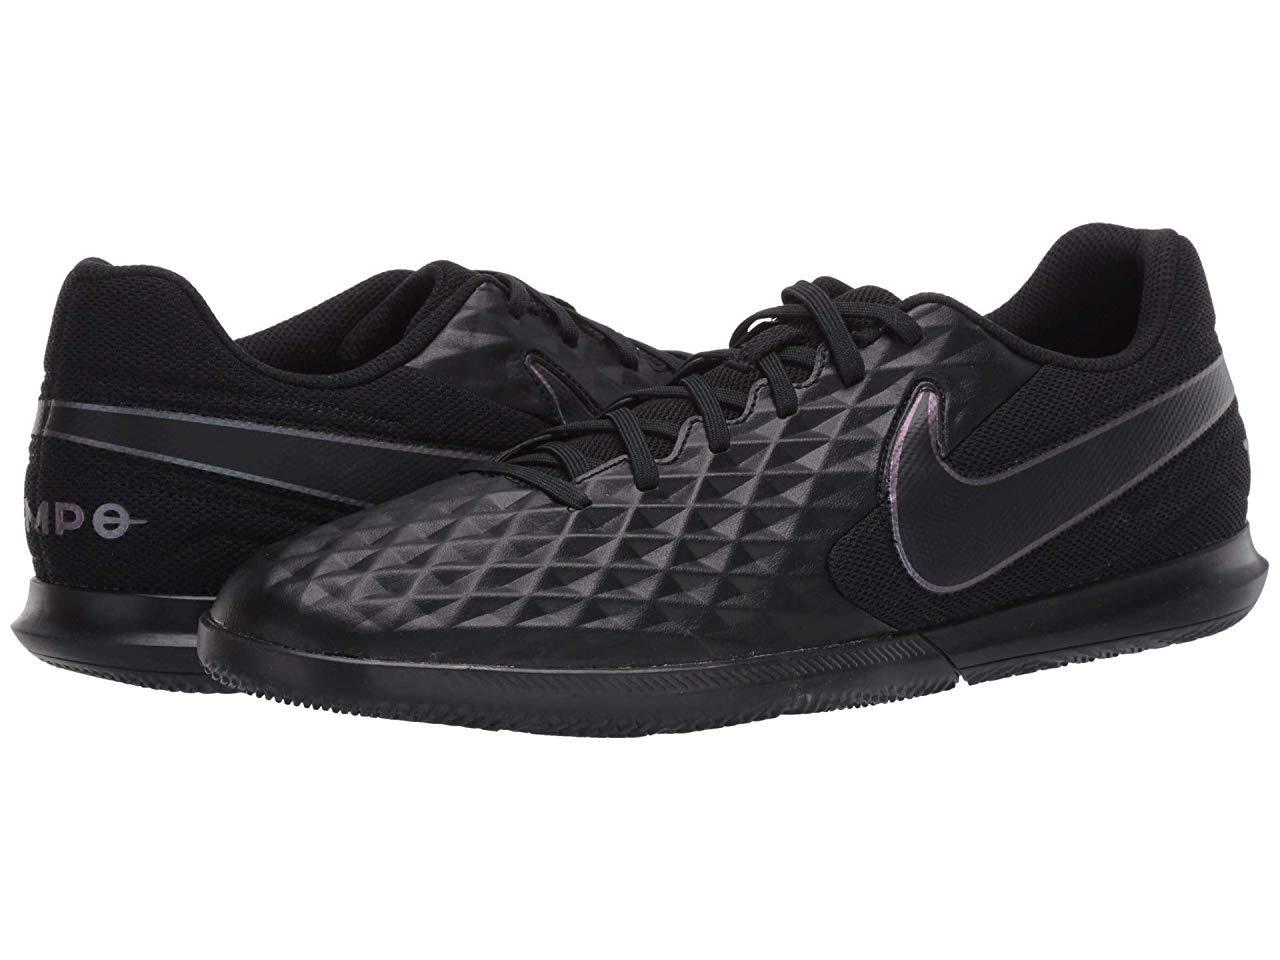 Кроссовки/Кеды Nike Legend 8 Club IC Black/Black